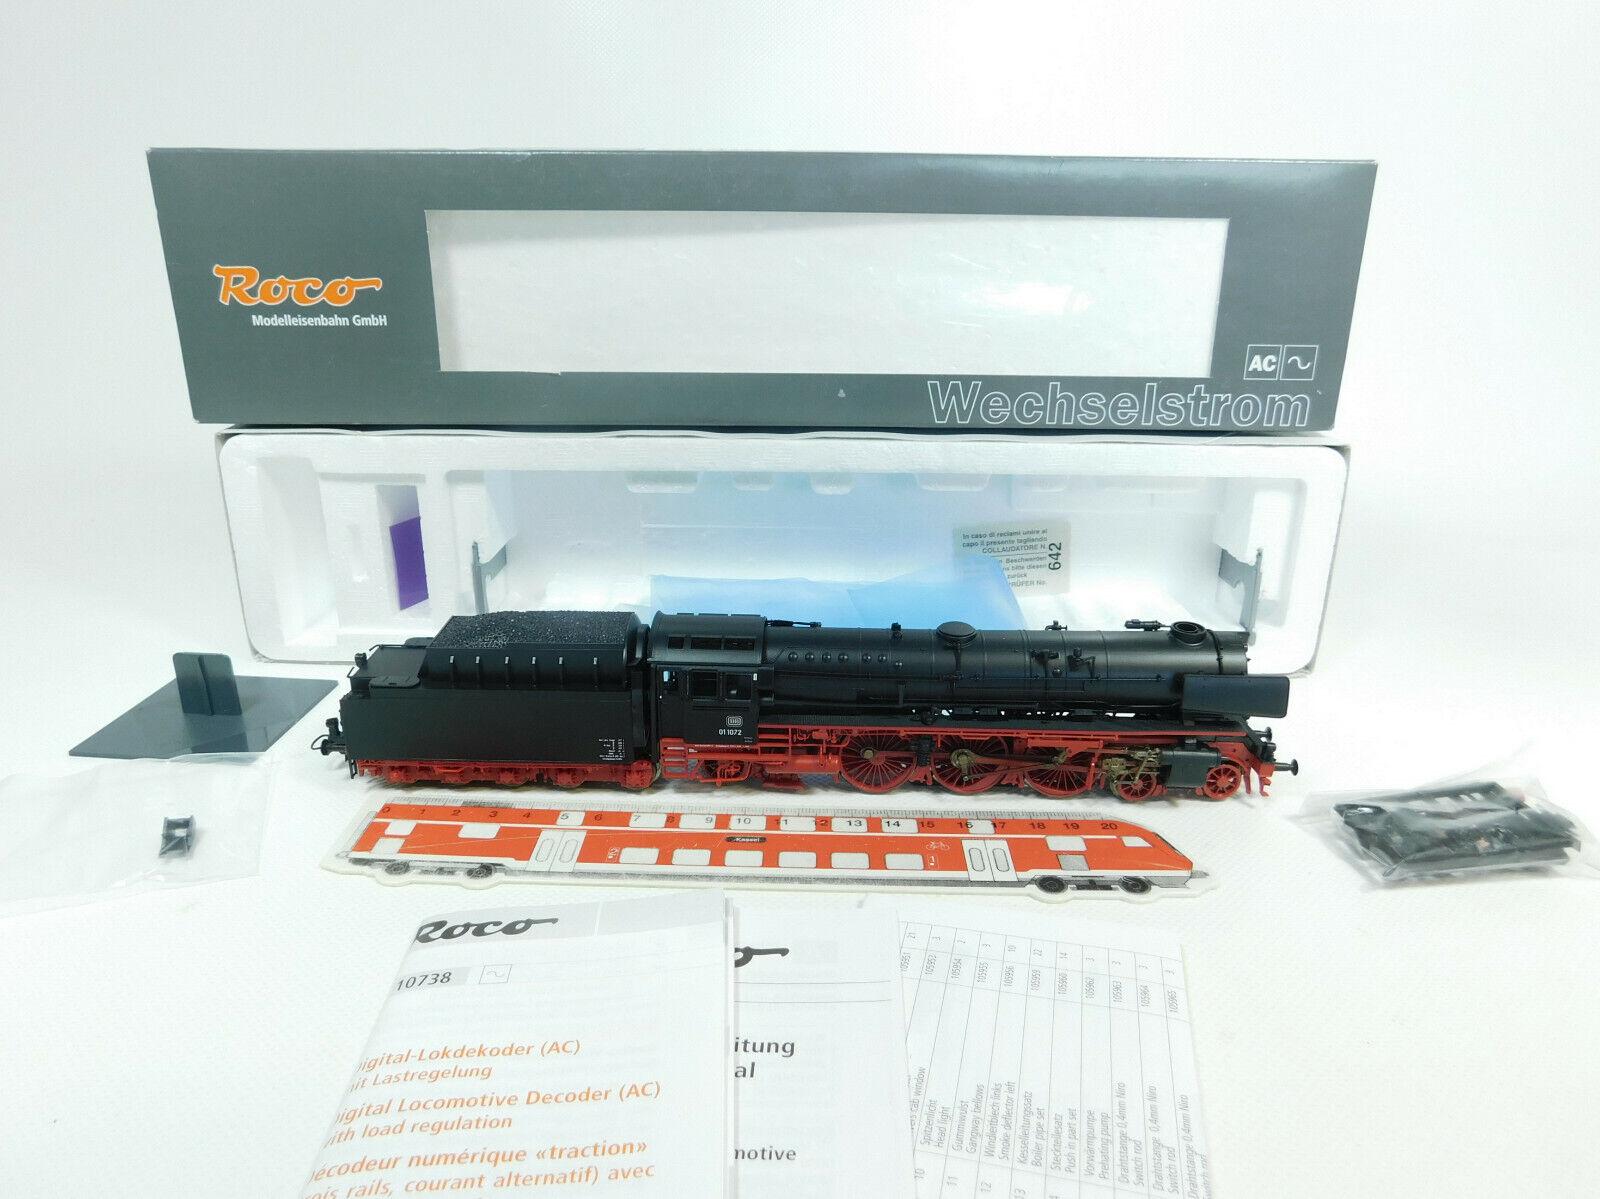 Bg555-1  roco h0 ac 69213 máquina de vapor vapor locomotora 01 1072 DB nem digital, embalaje original